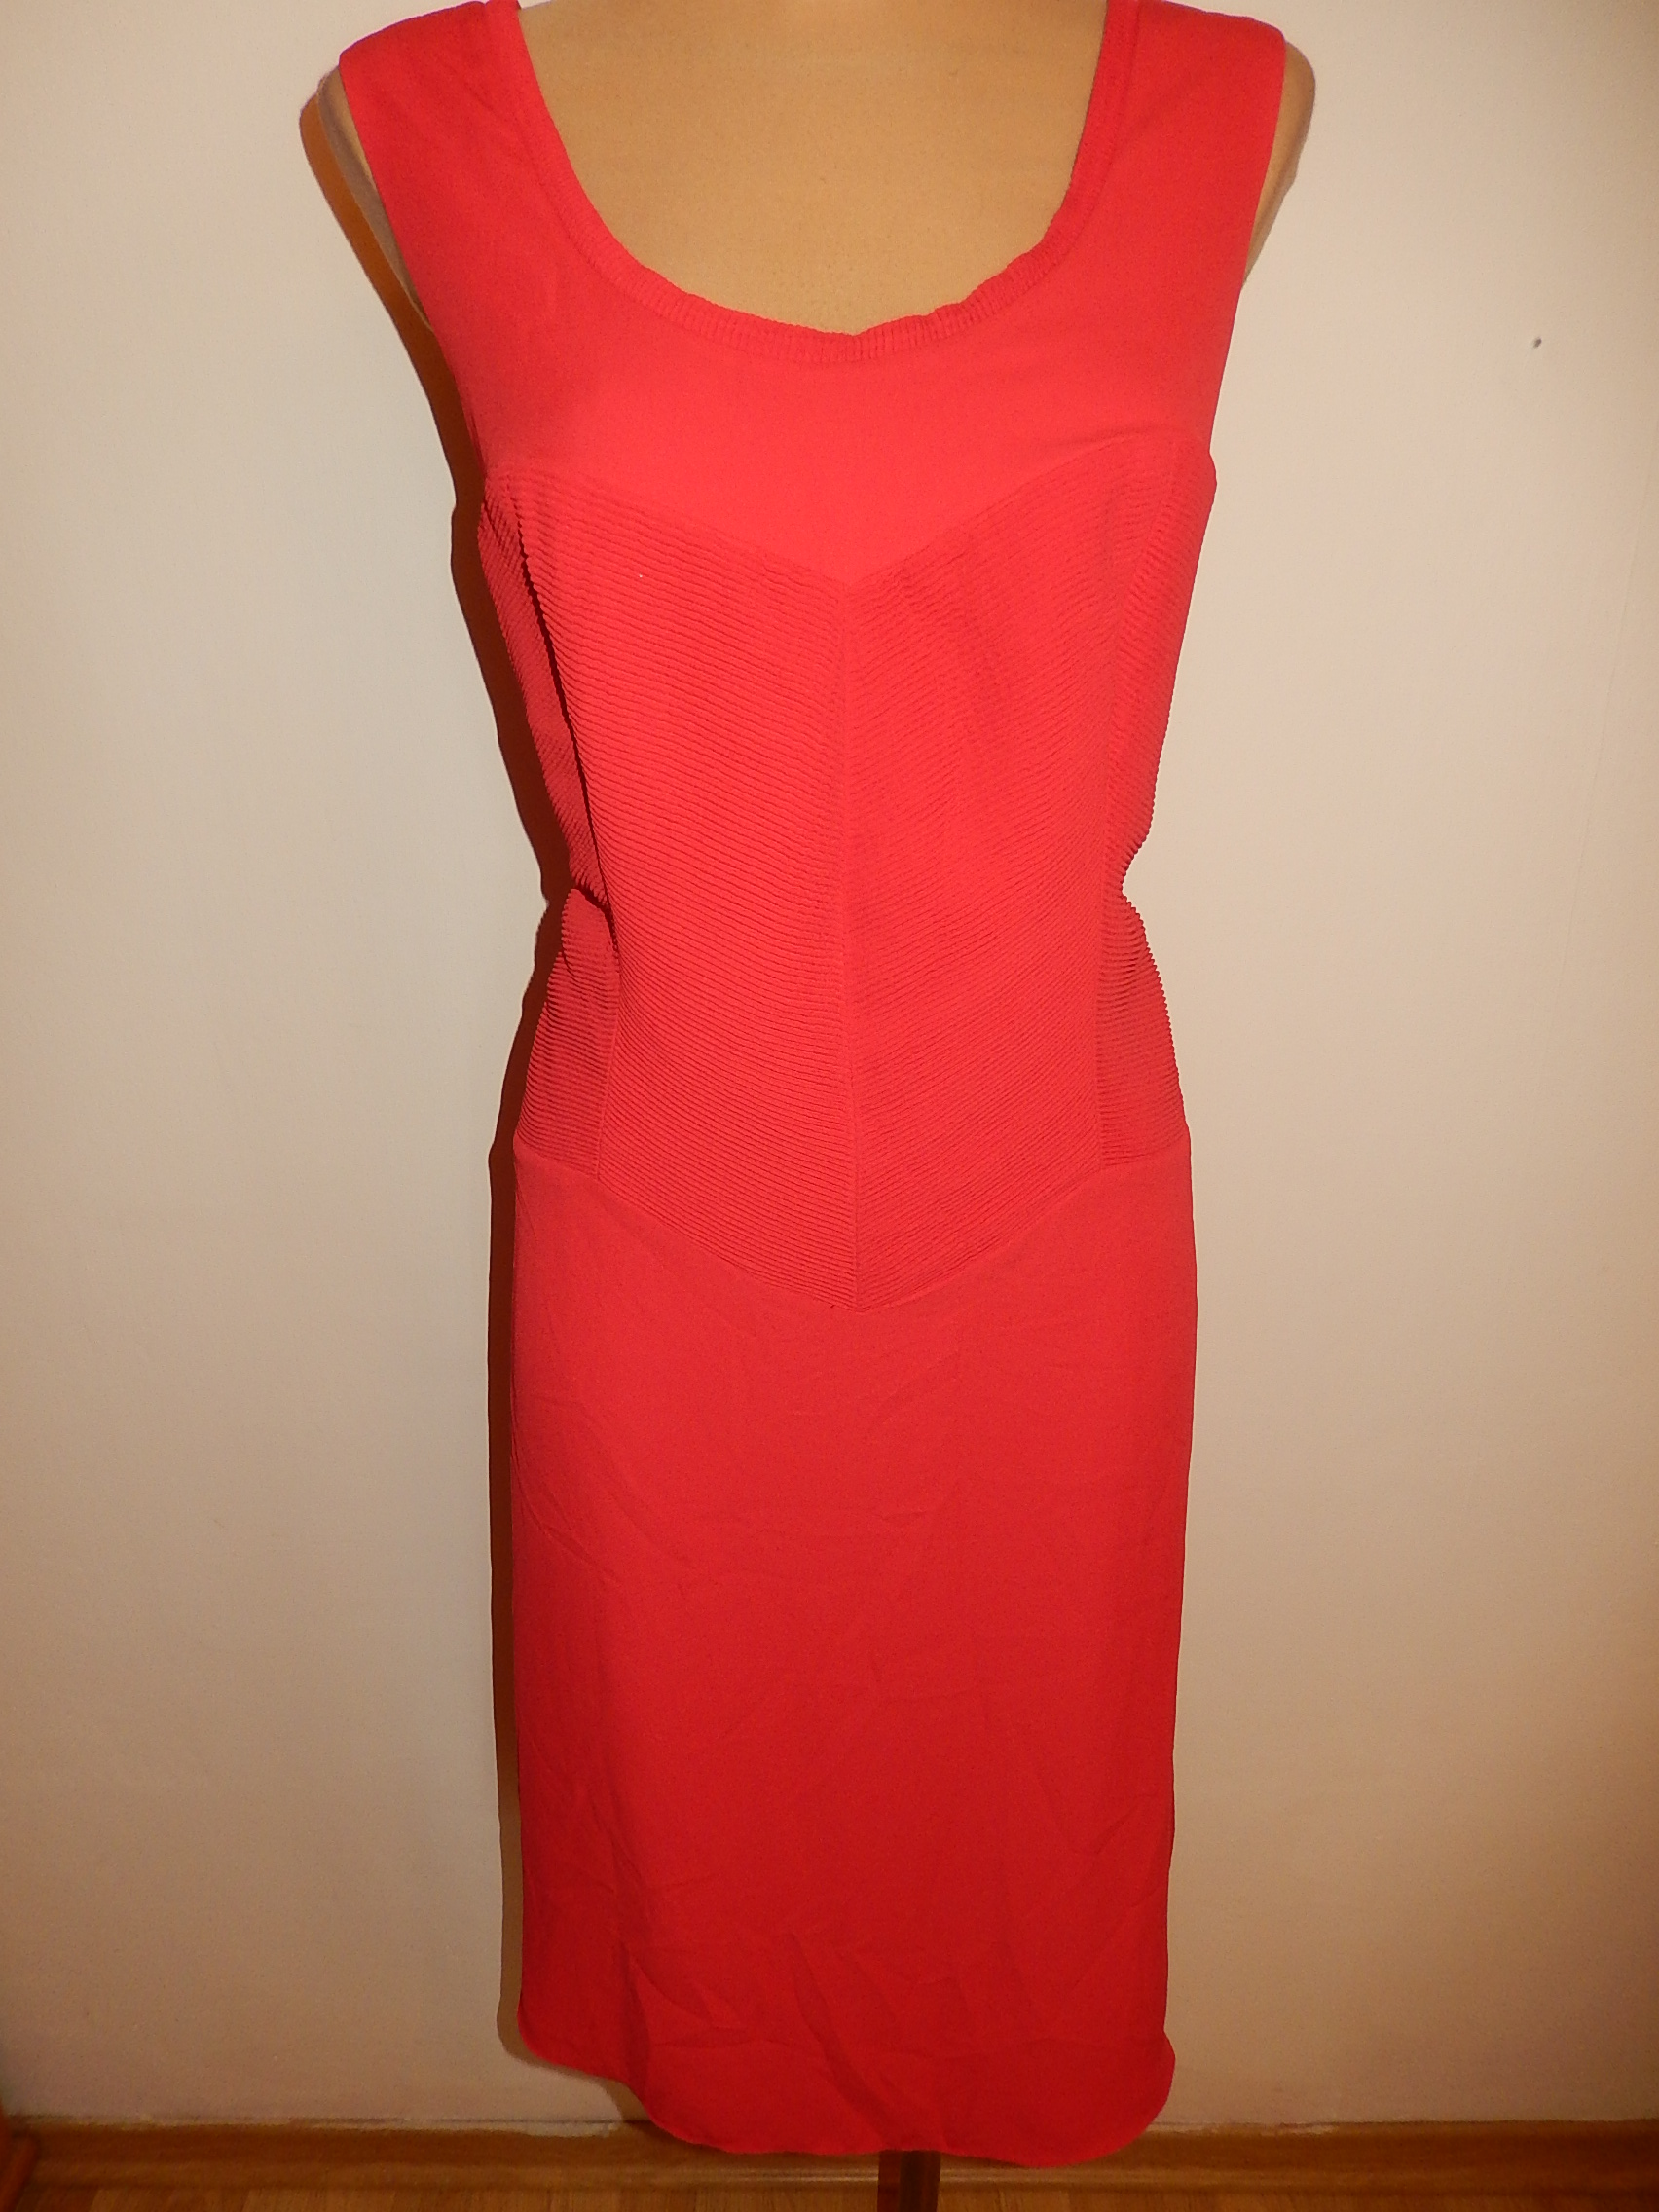 5ea23d1028 SAVOIR sukienka koktajlowa r.44 46~falek18 - 7393729905 - oficjalne ...